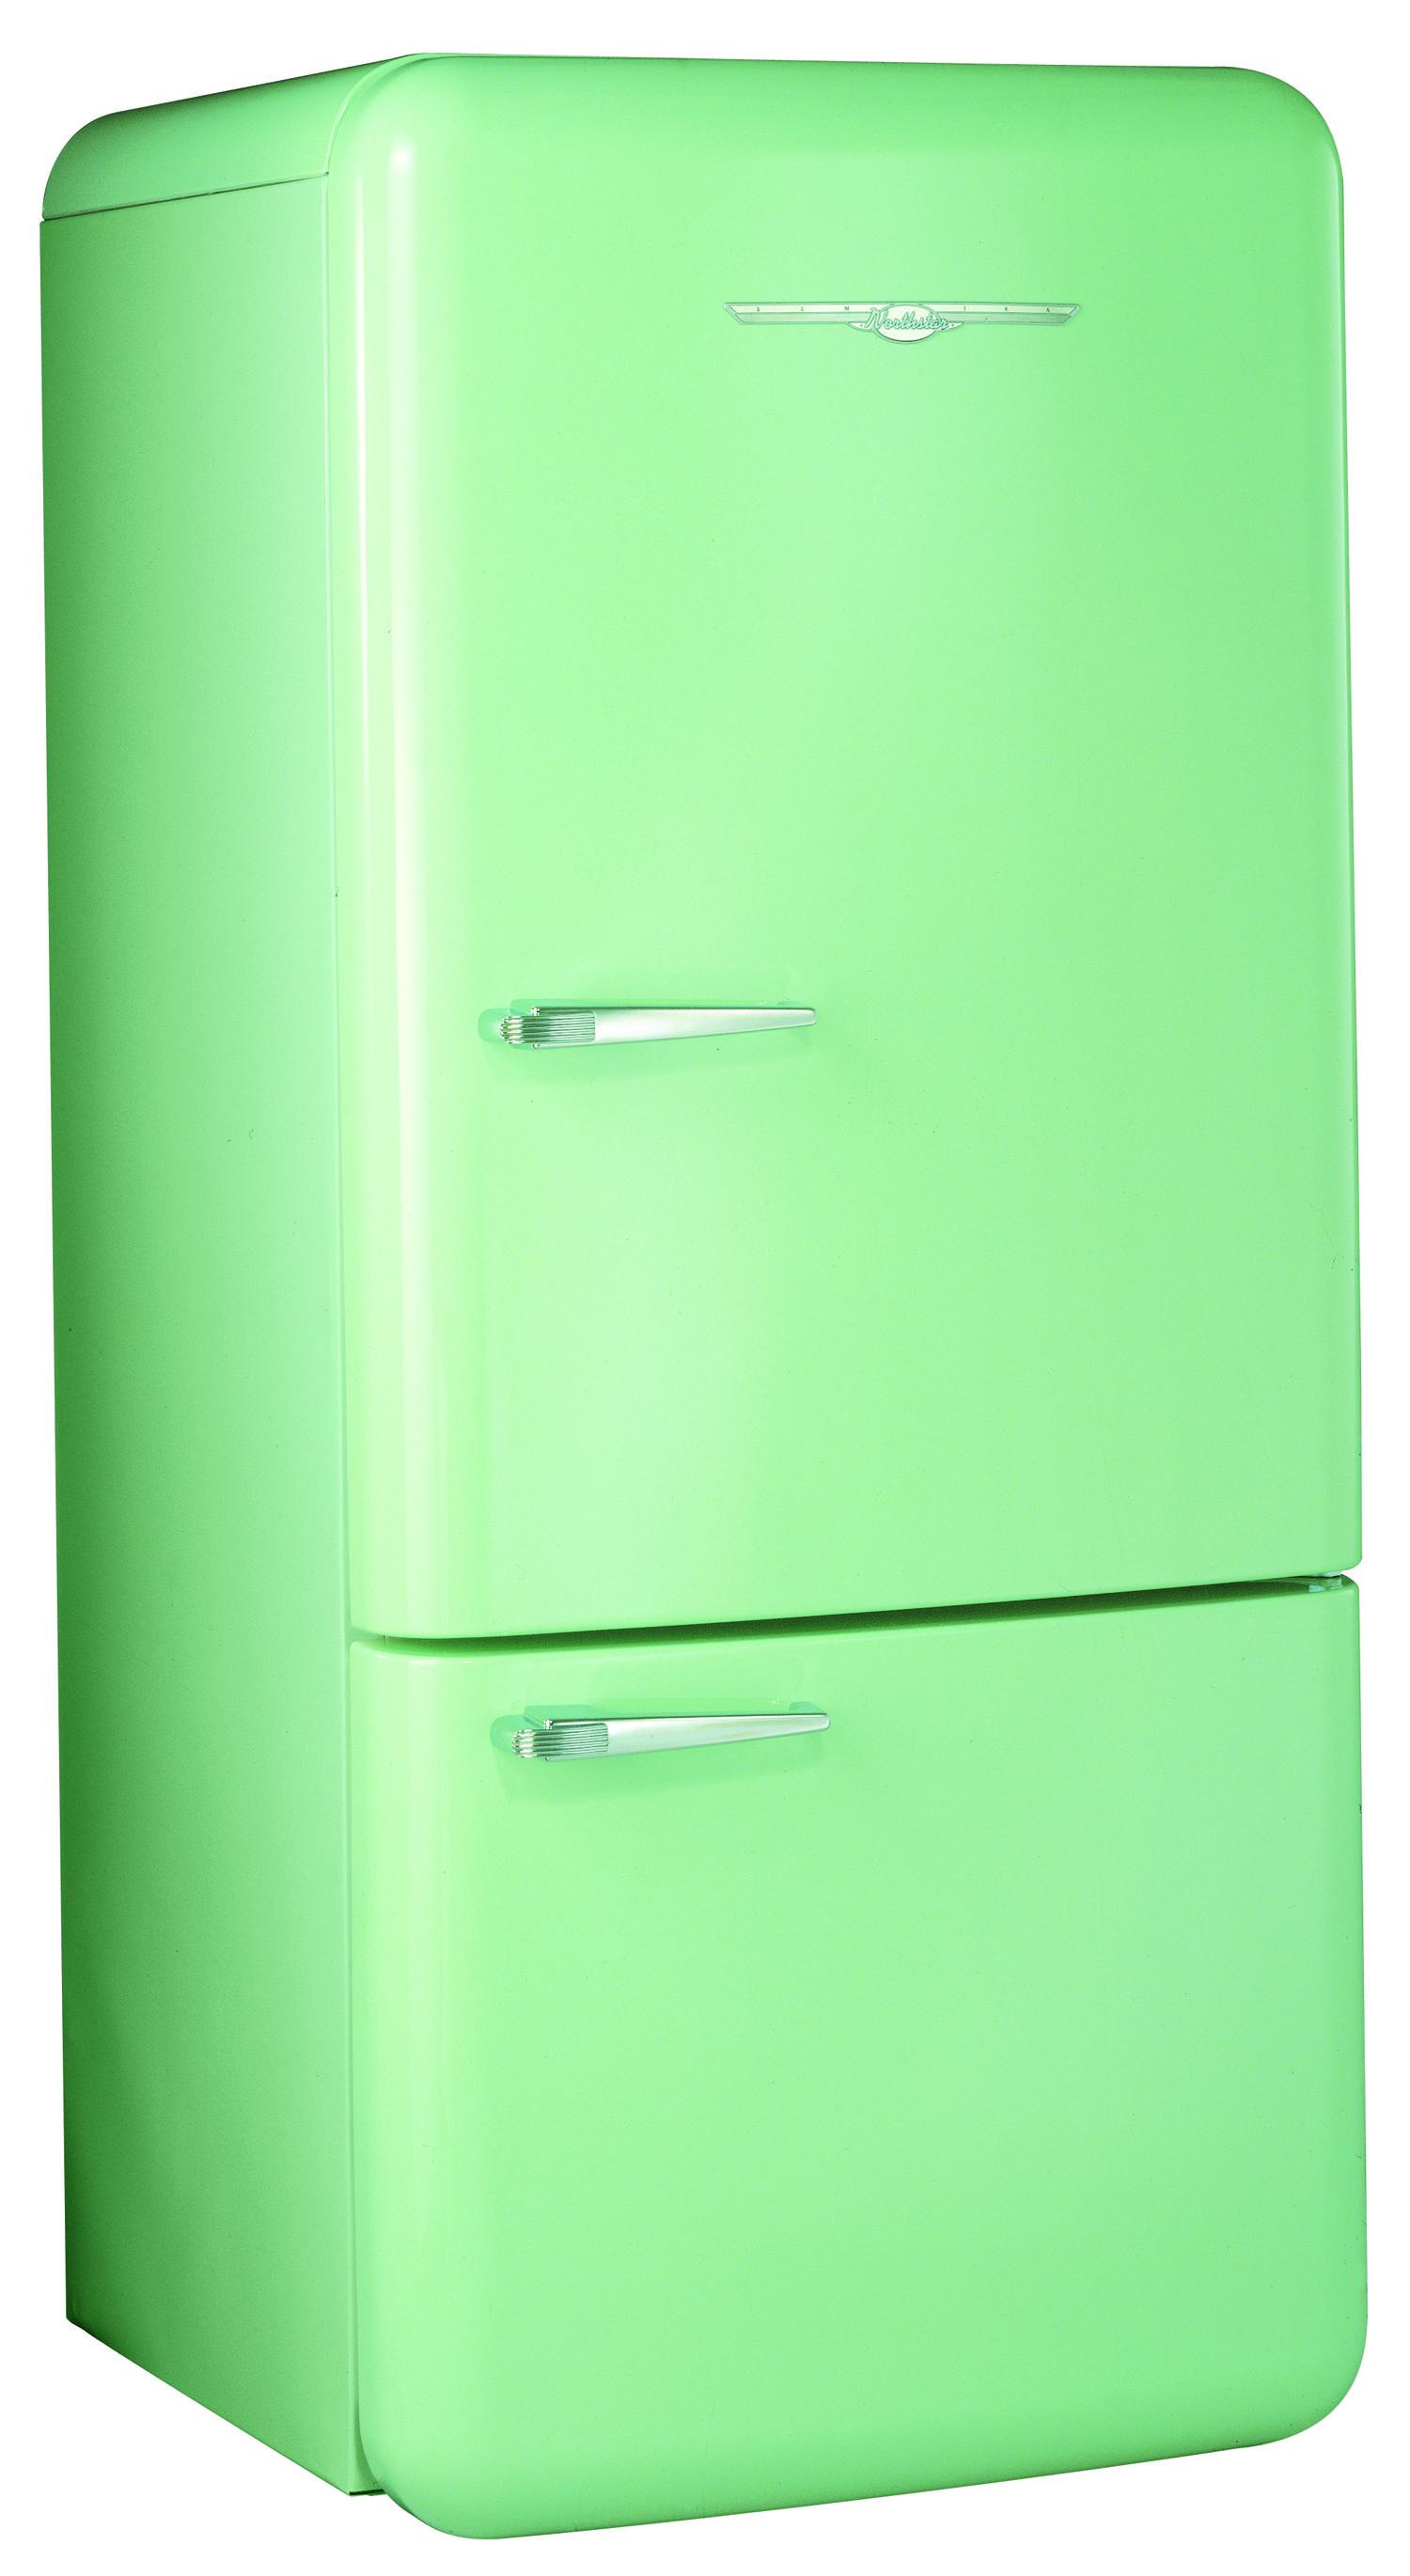 modern retro refrigerators refrigerators in the